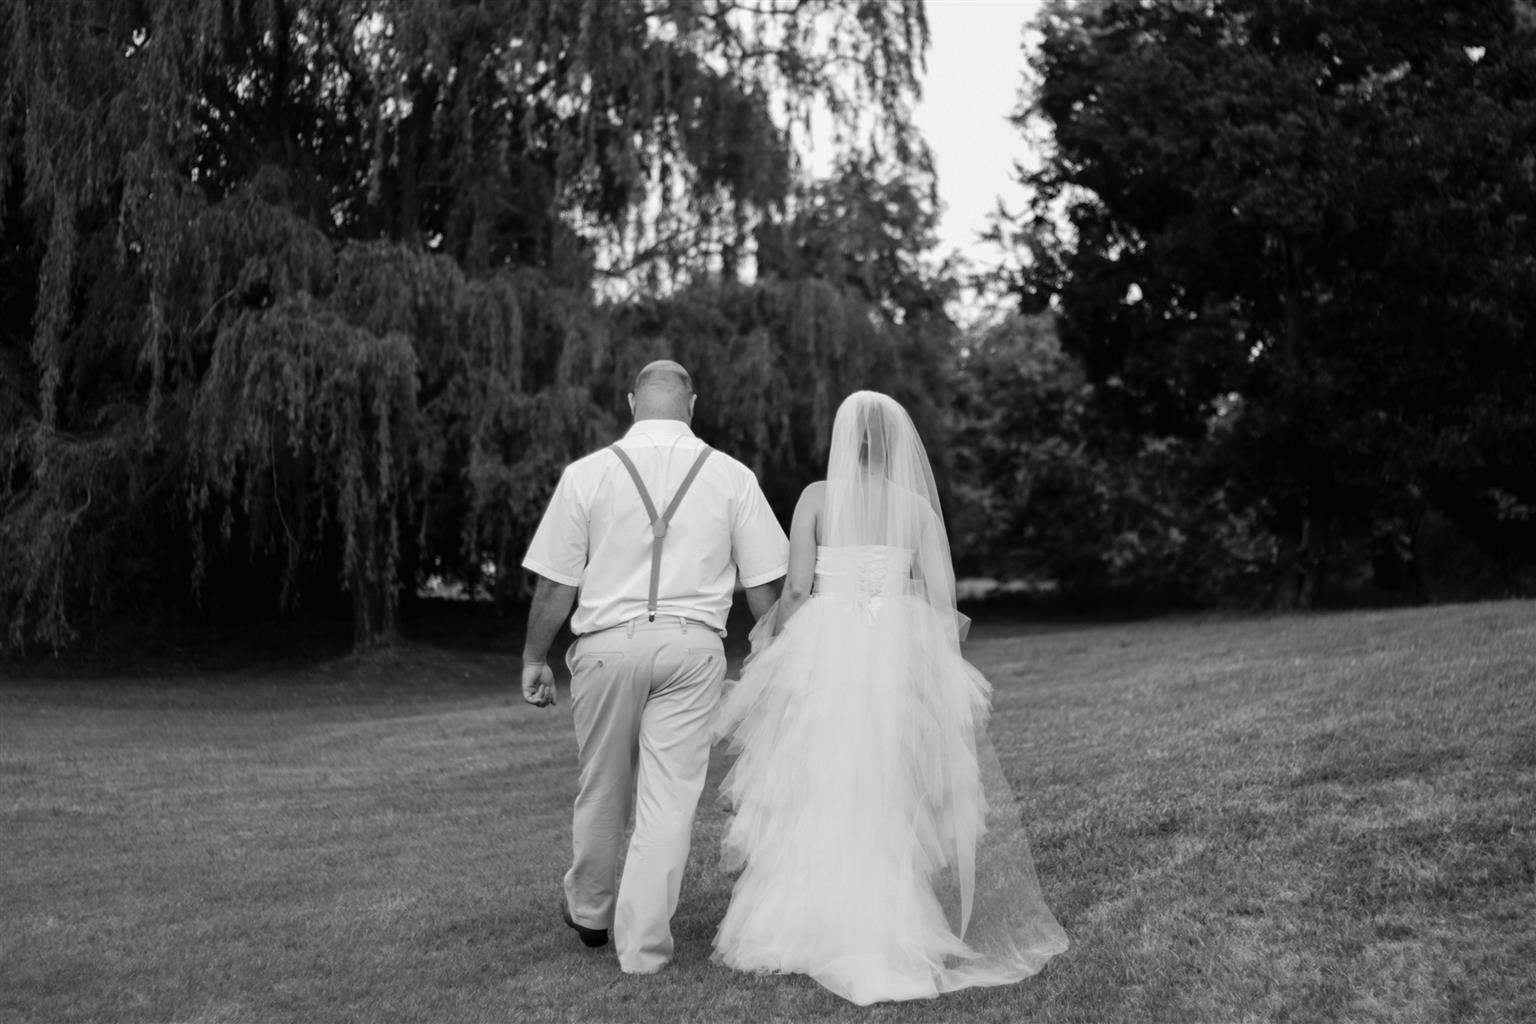 Ivory Wedding Dress and Veil